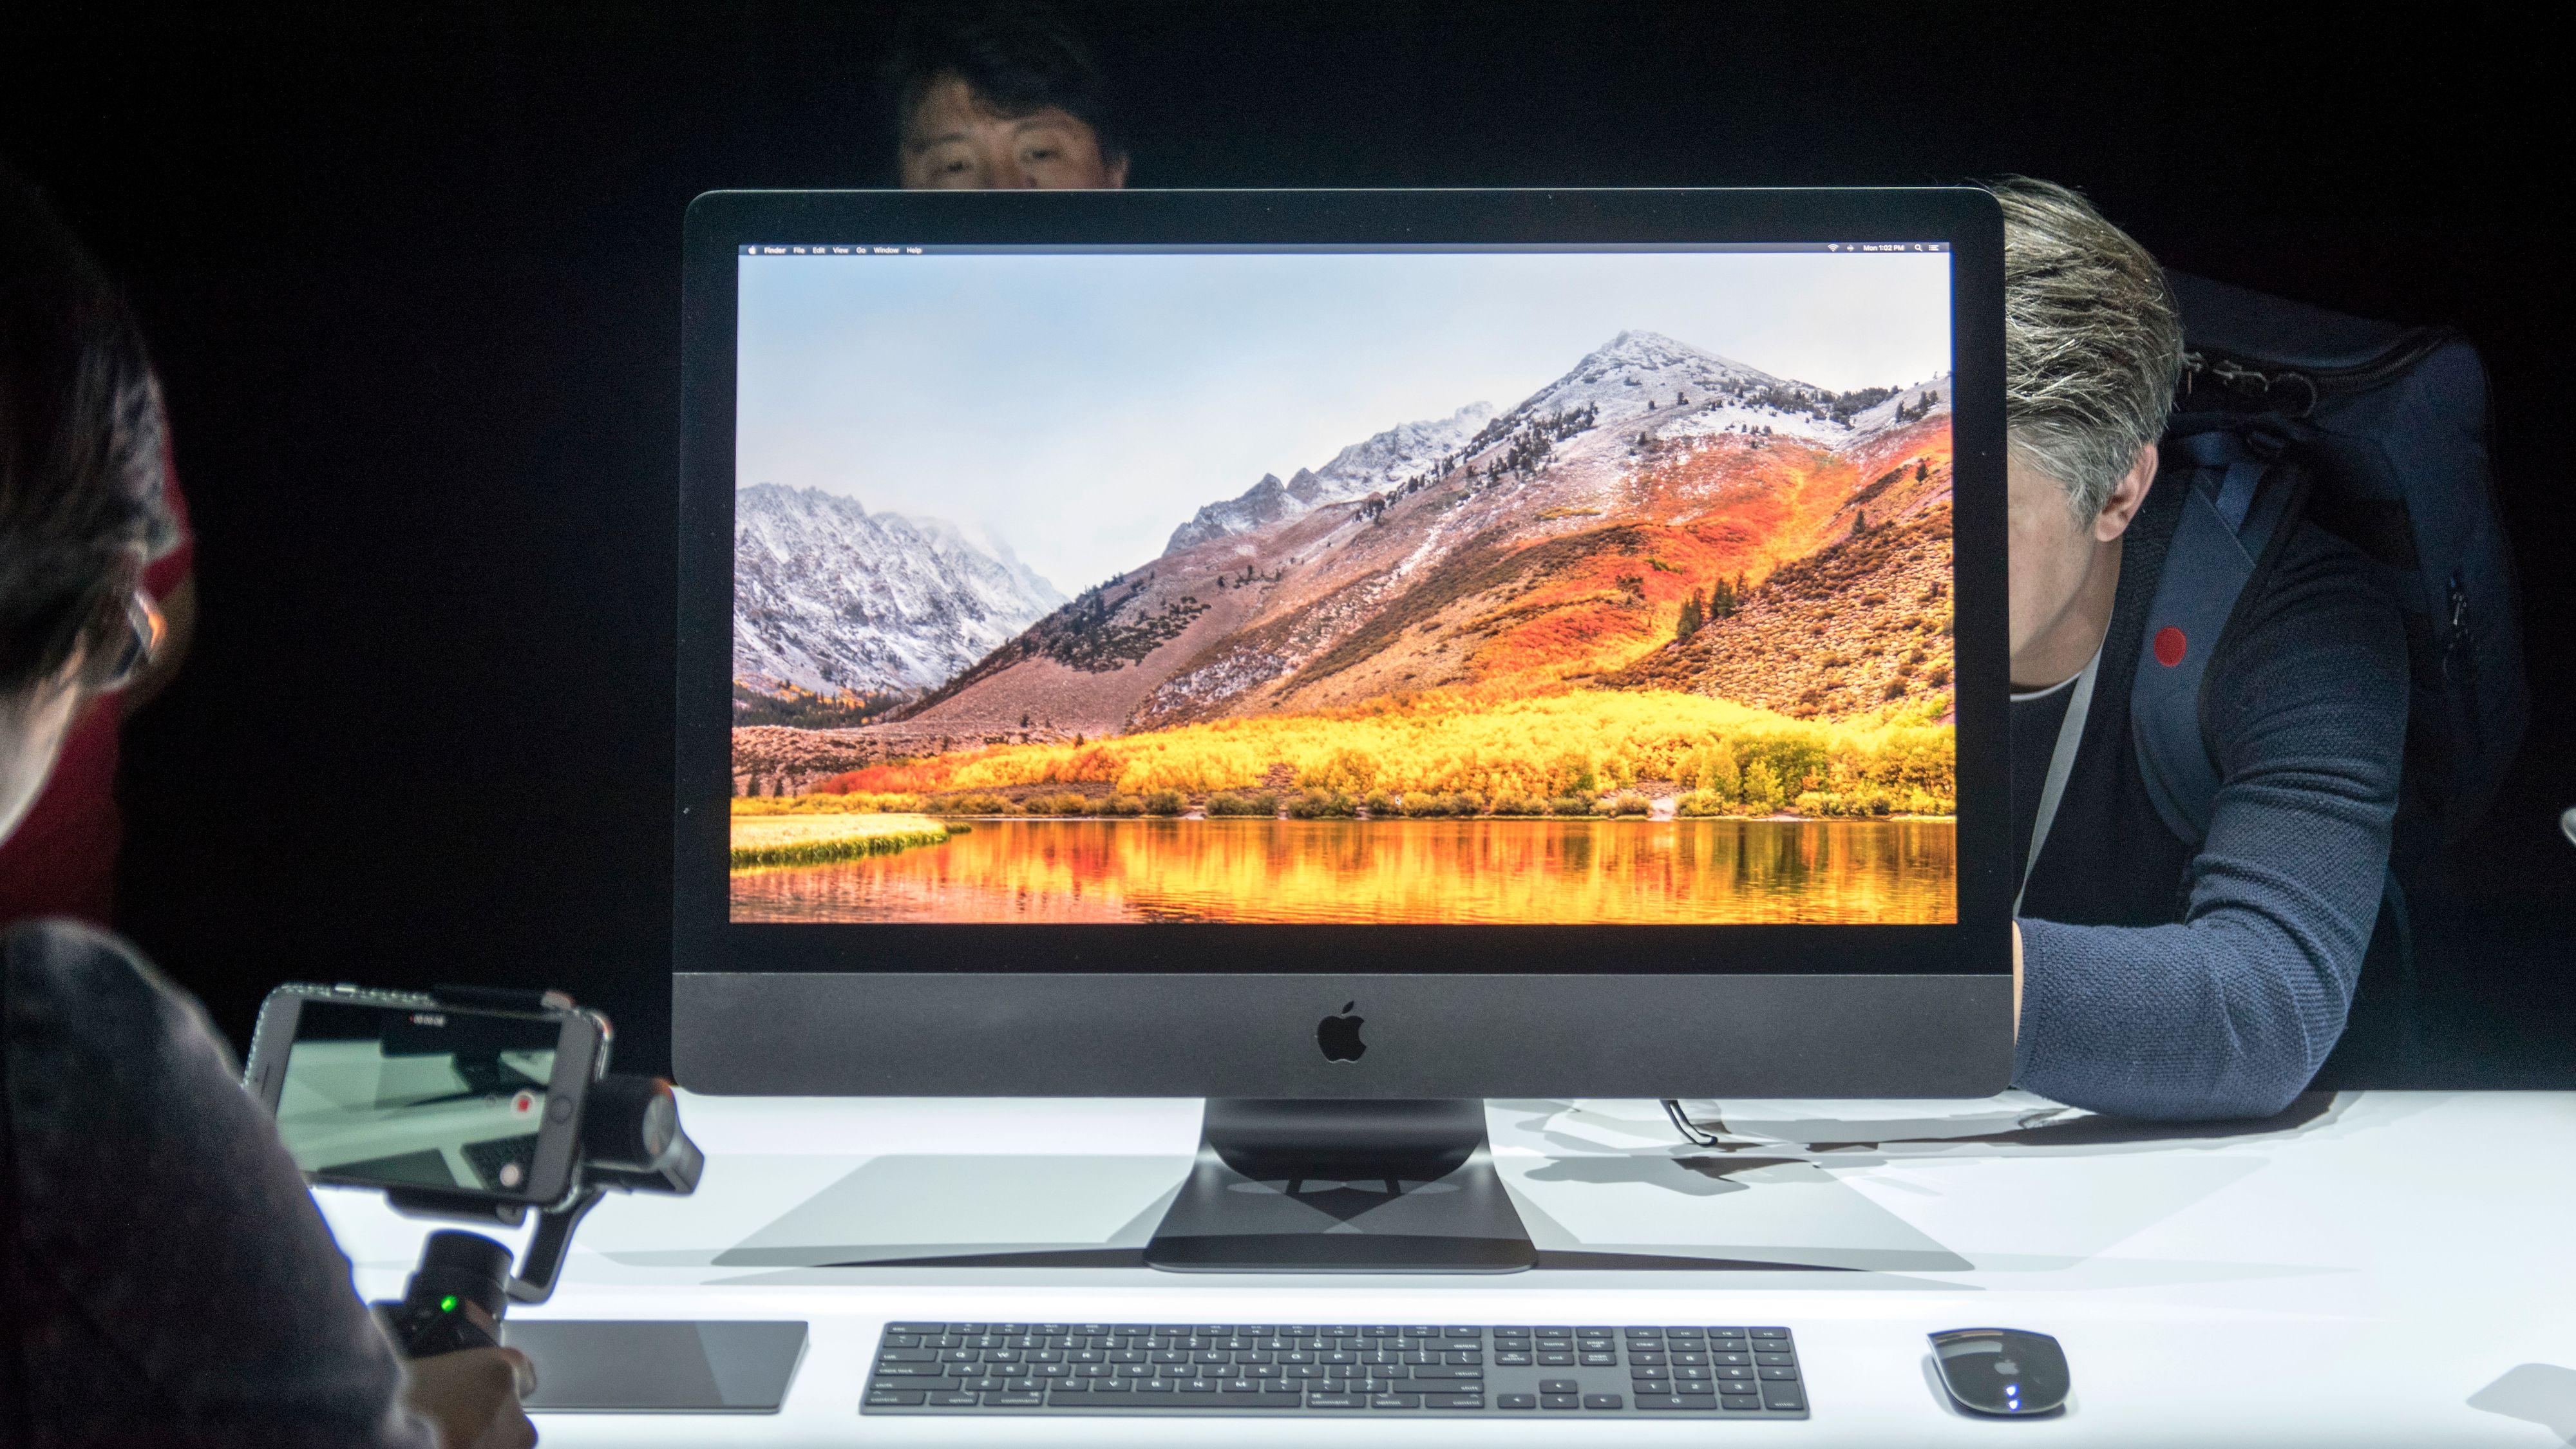 Ekstreme iMac Pro slippes i dag